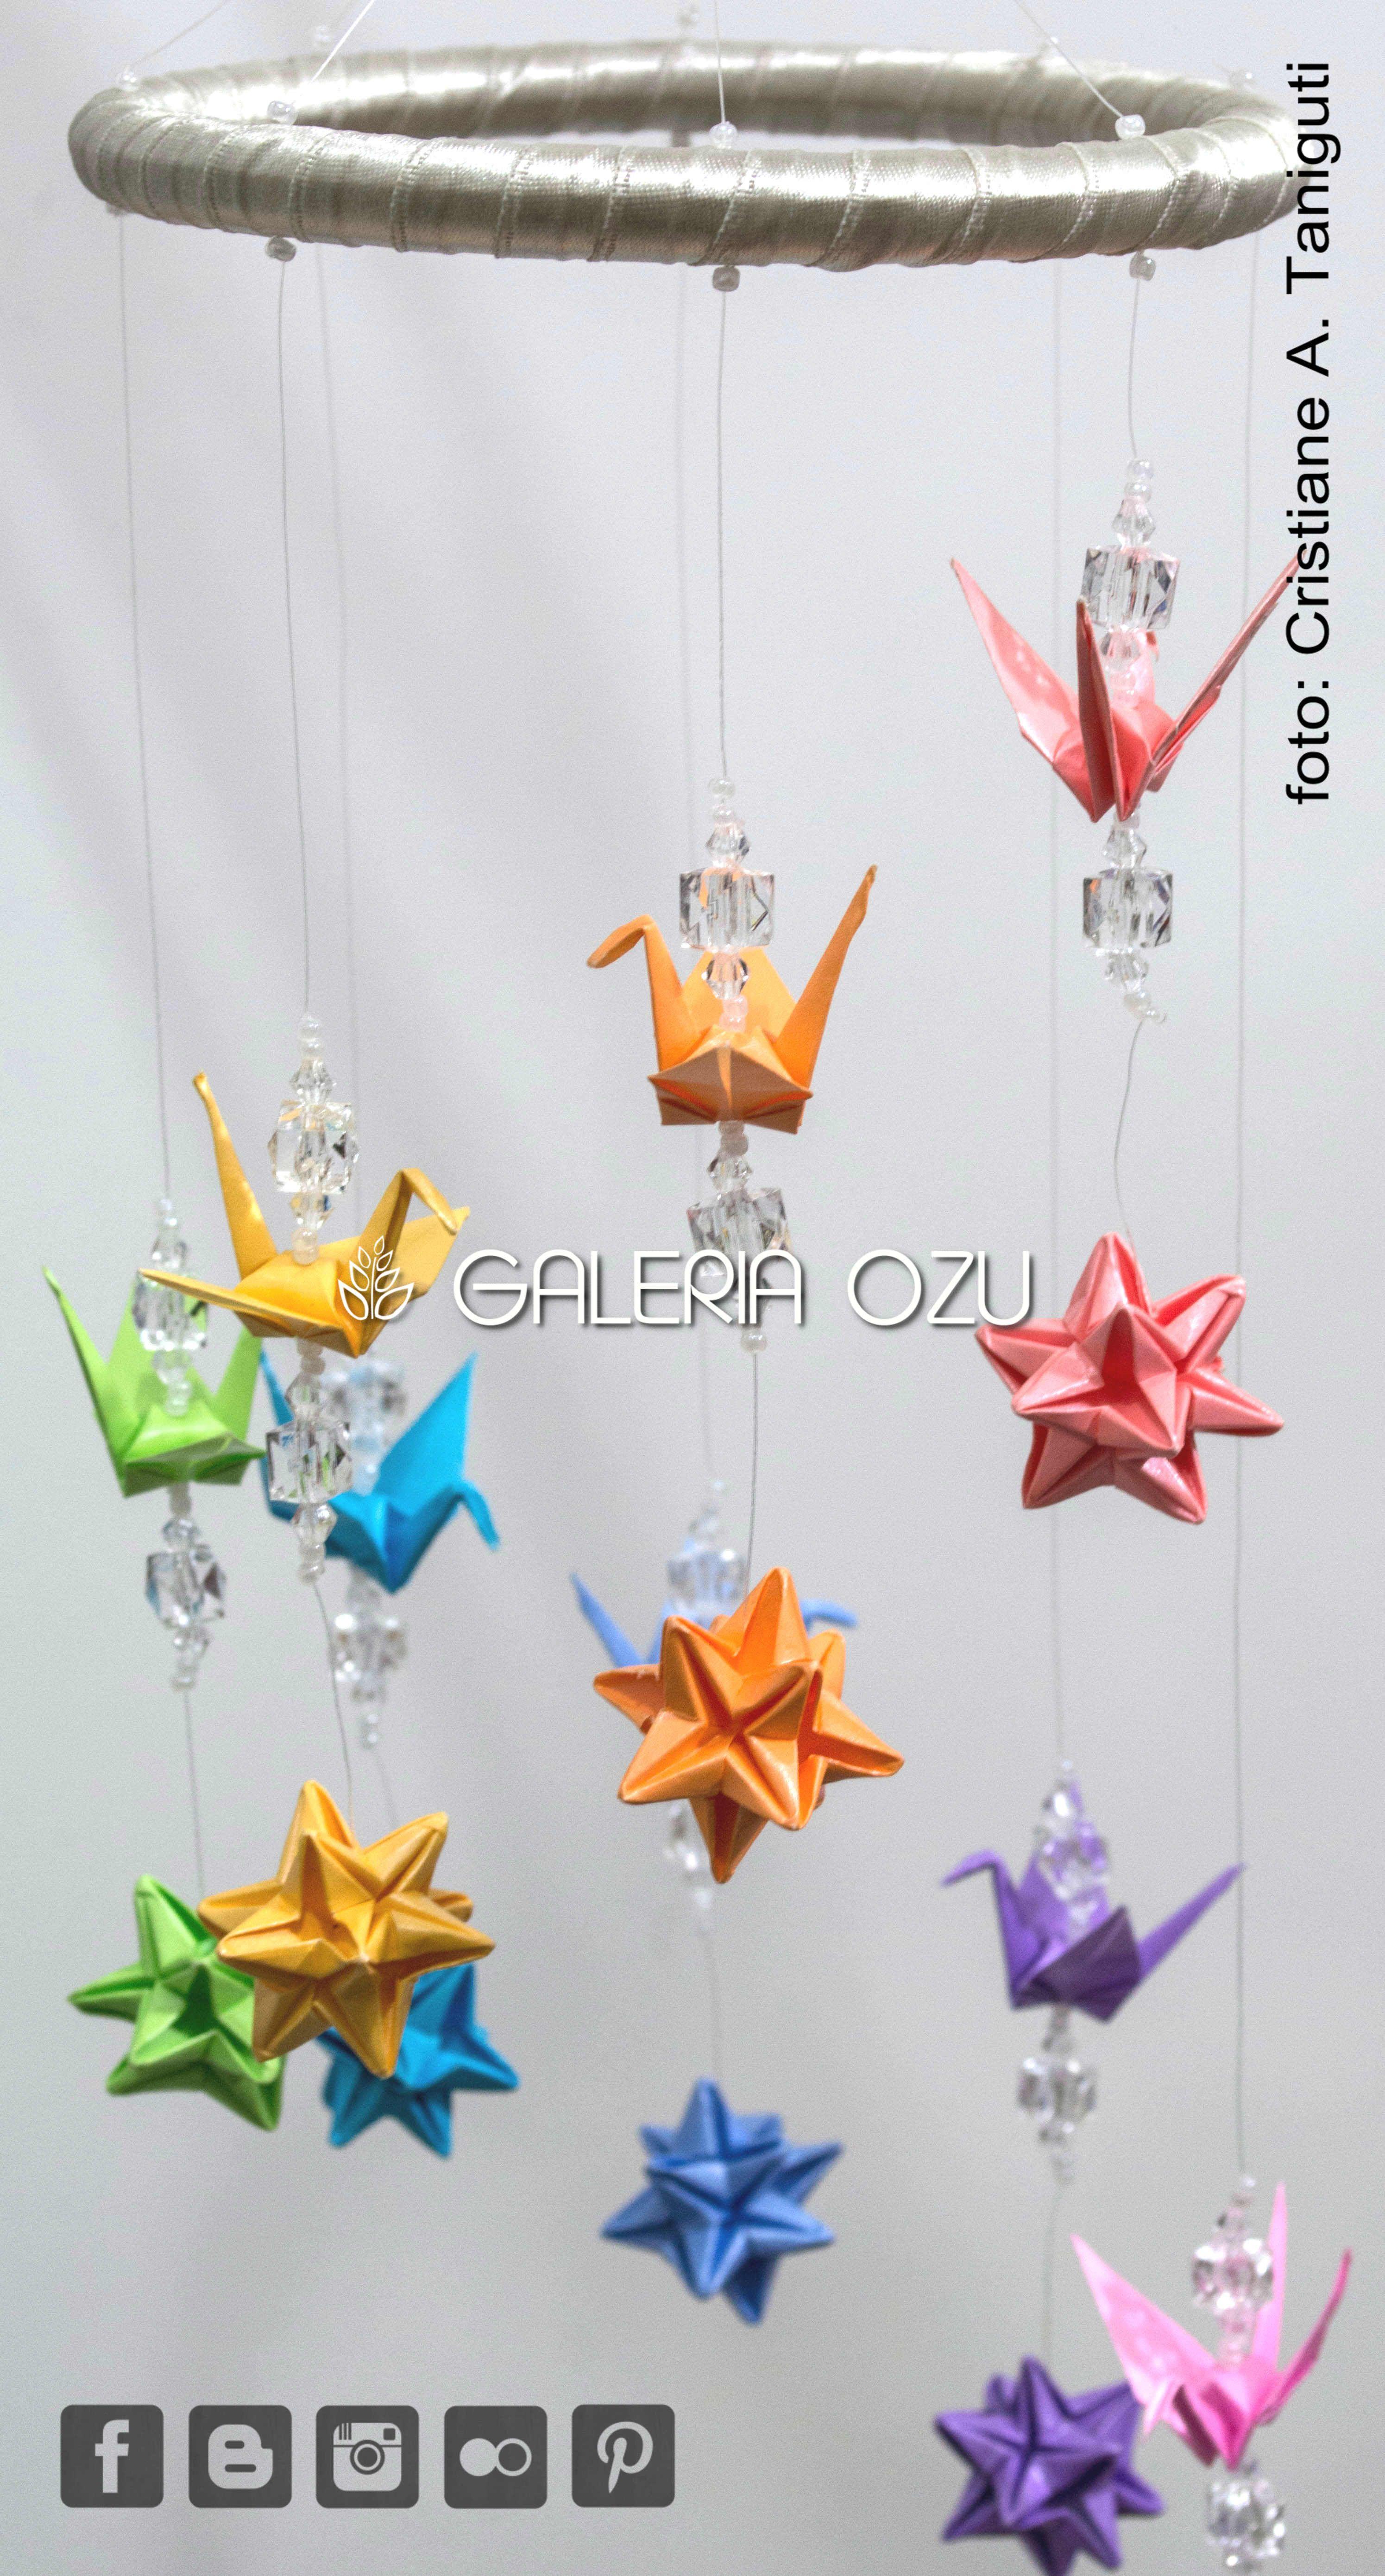 Tsuru Rose Origami T Asa E Rosas Fireworks Diagram Mobile Crane Galeriaozu Indaiatuba